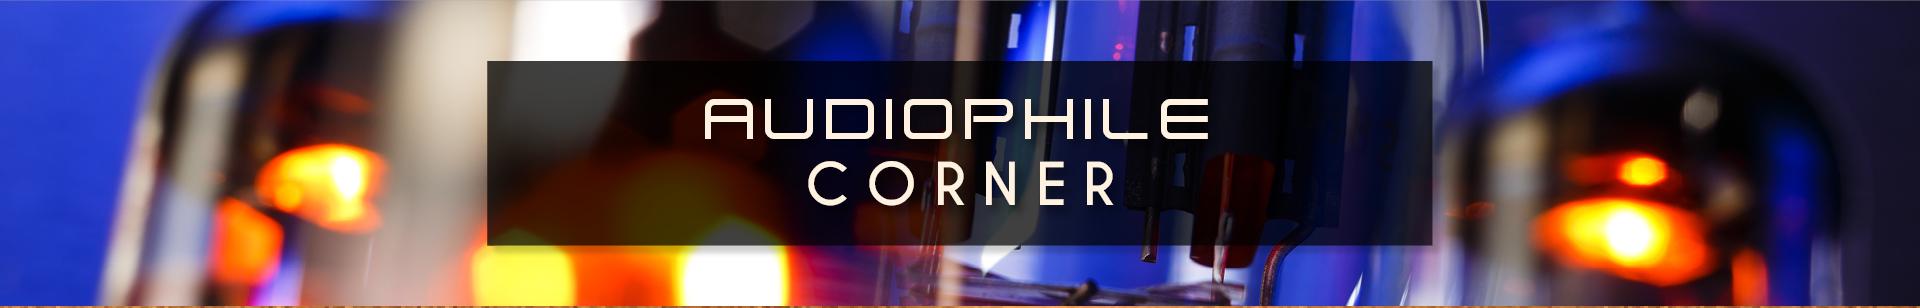 Audiophiles Corner